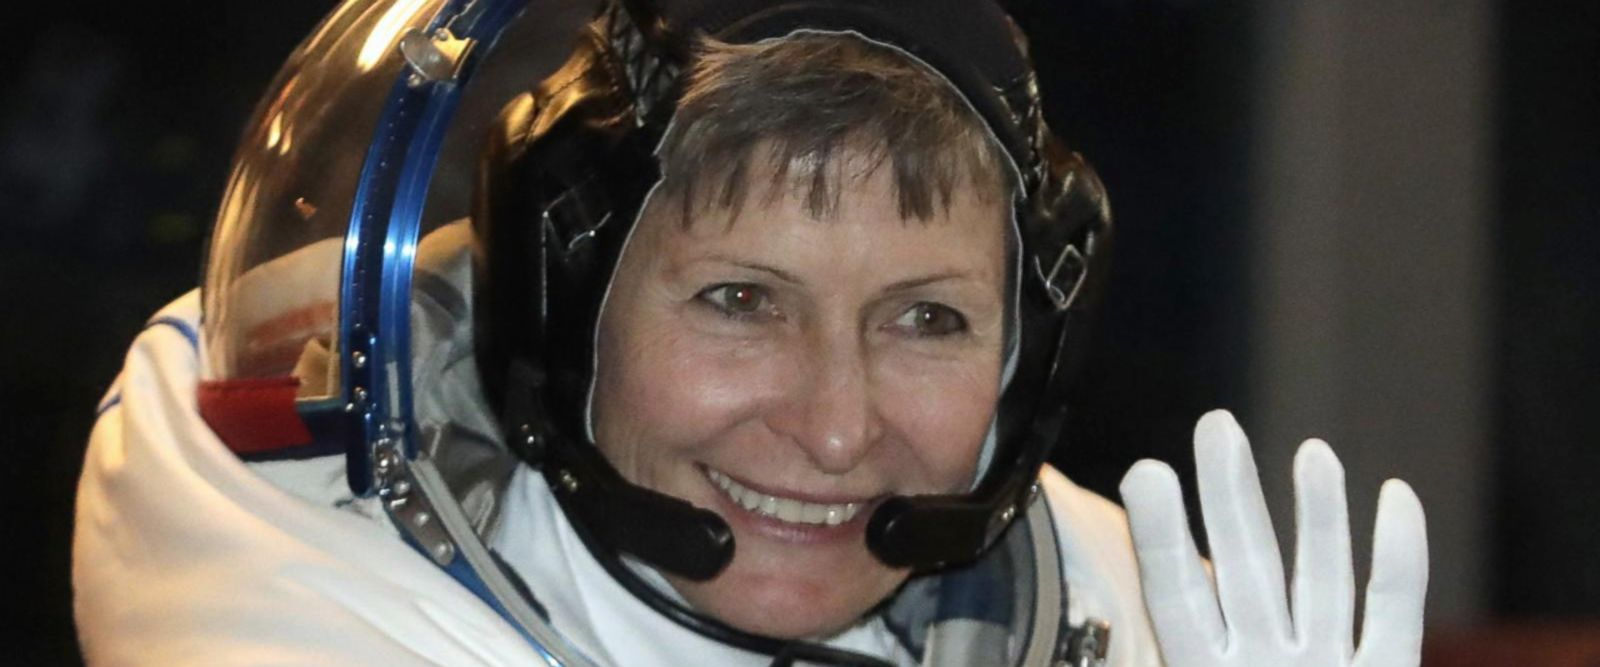 VIDEO: US astronaut blasts into the history books